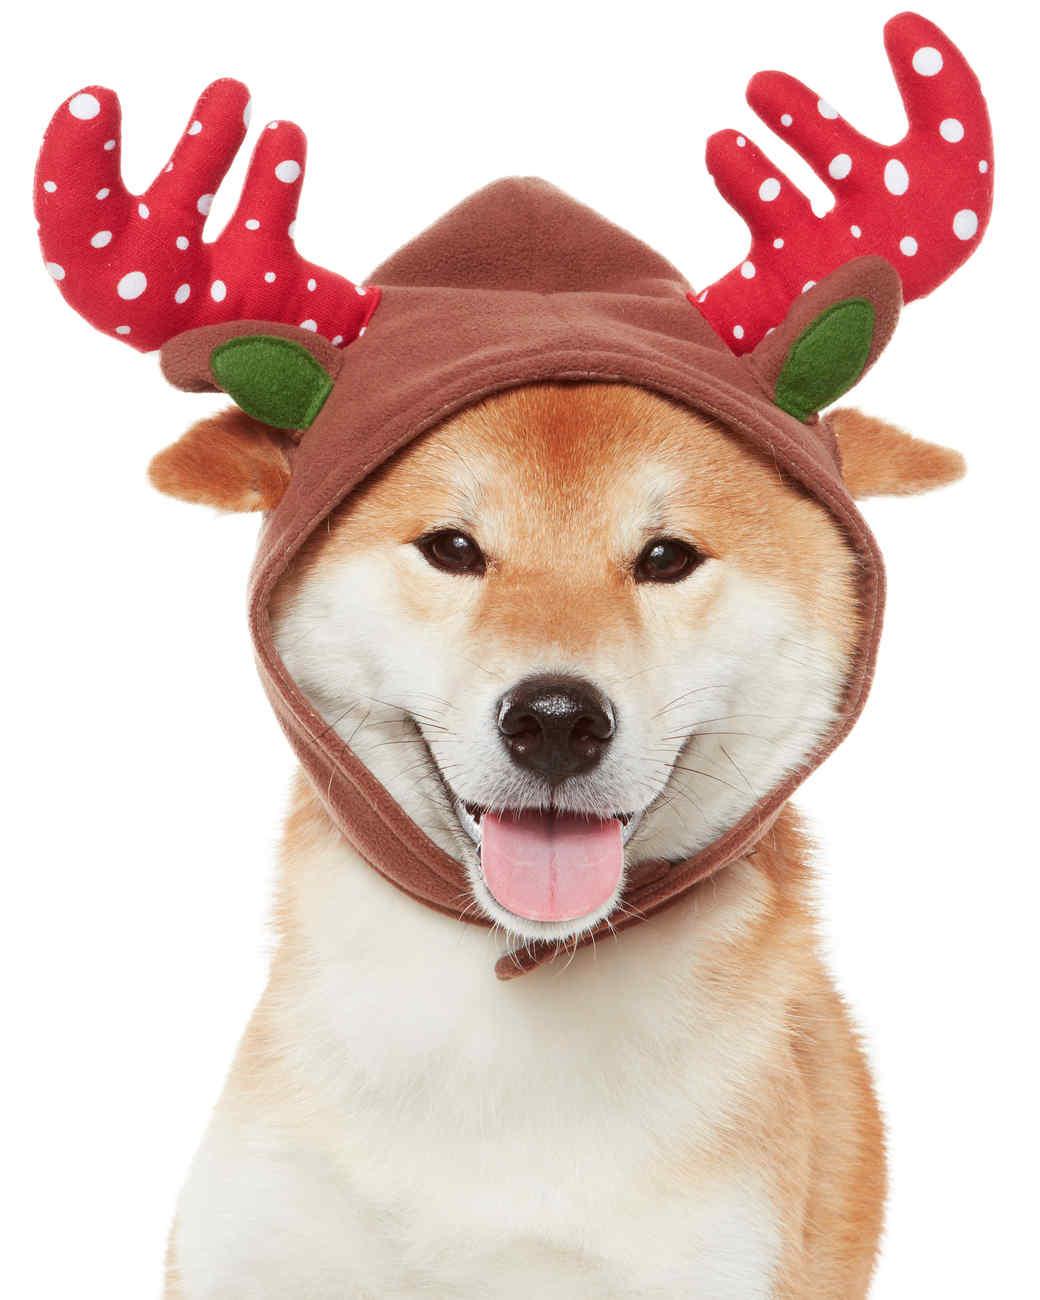 mspets-holiday-reindeerantlers-mrkt-1113.jpg